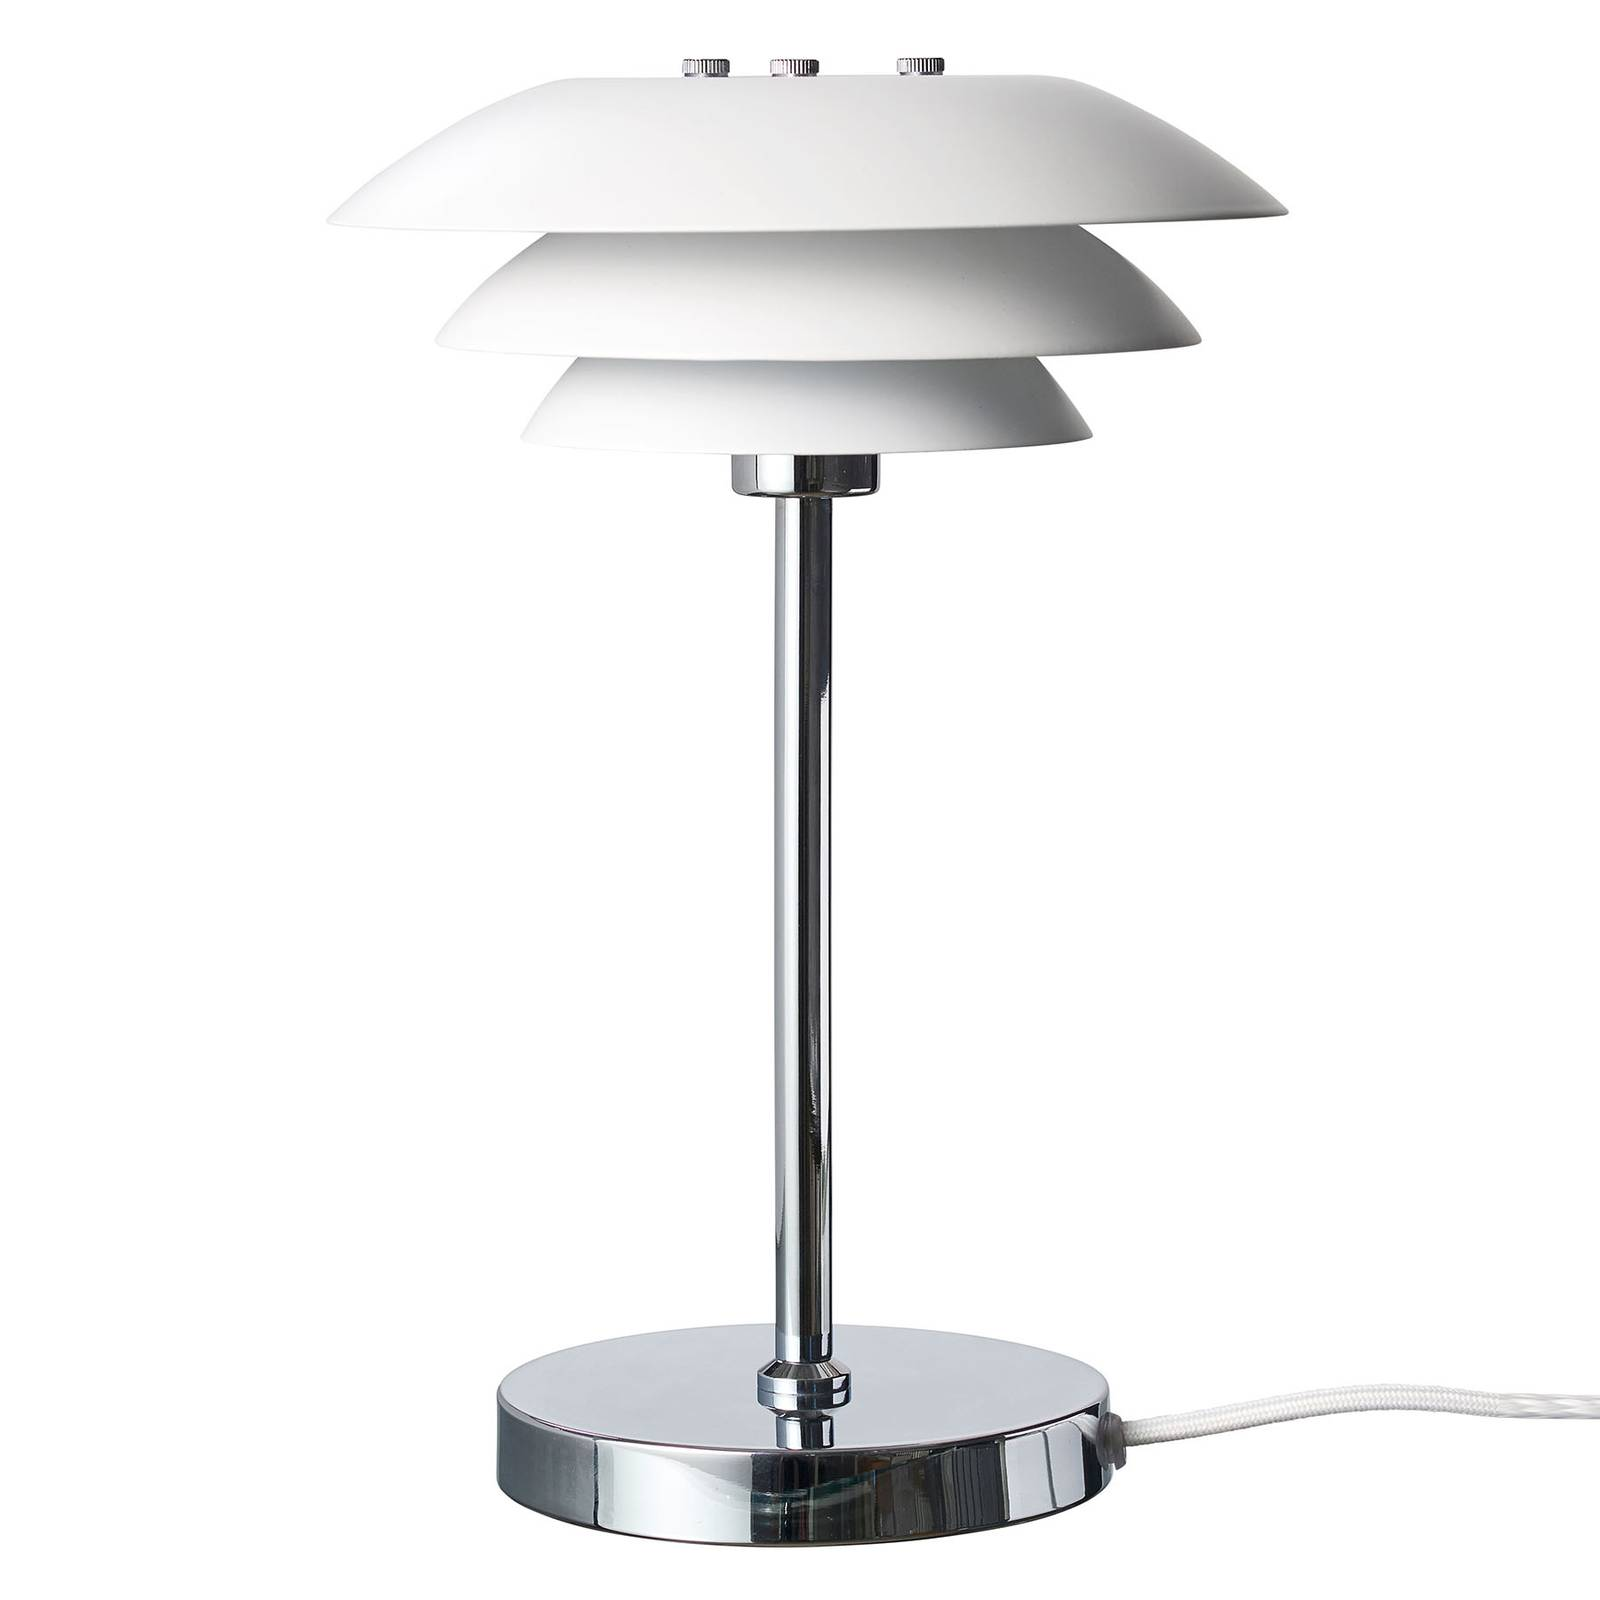 Dyberg Larsen DL20 -pöytälamppu Ø 20 cm, valkoinen